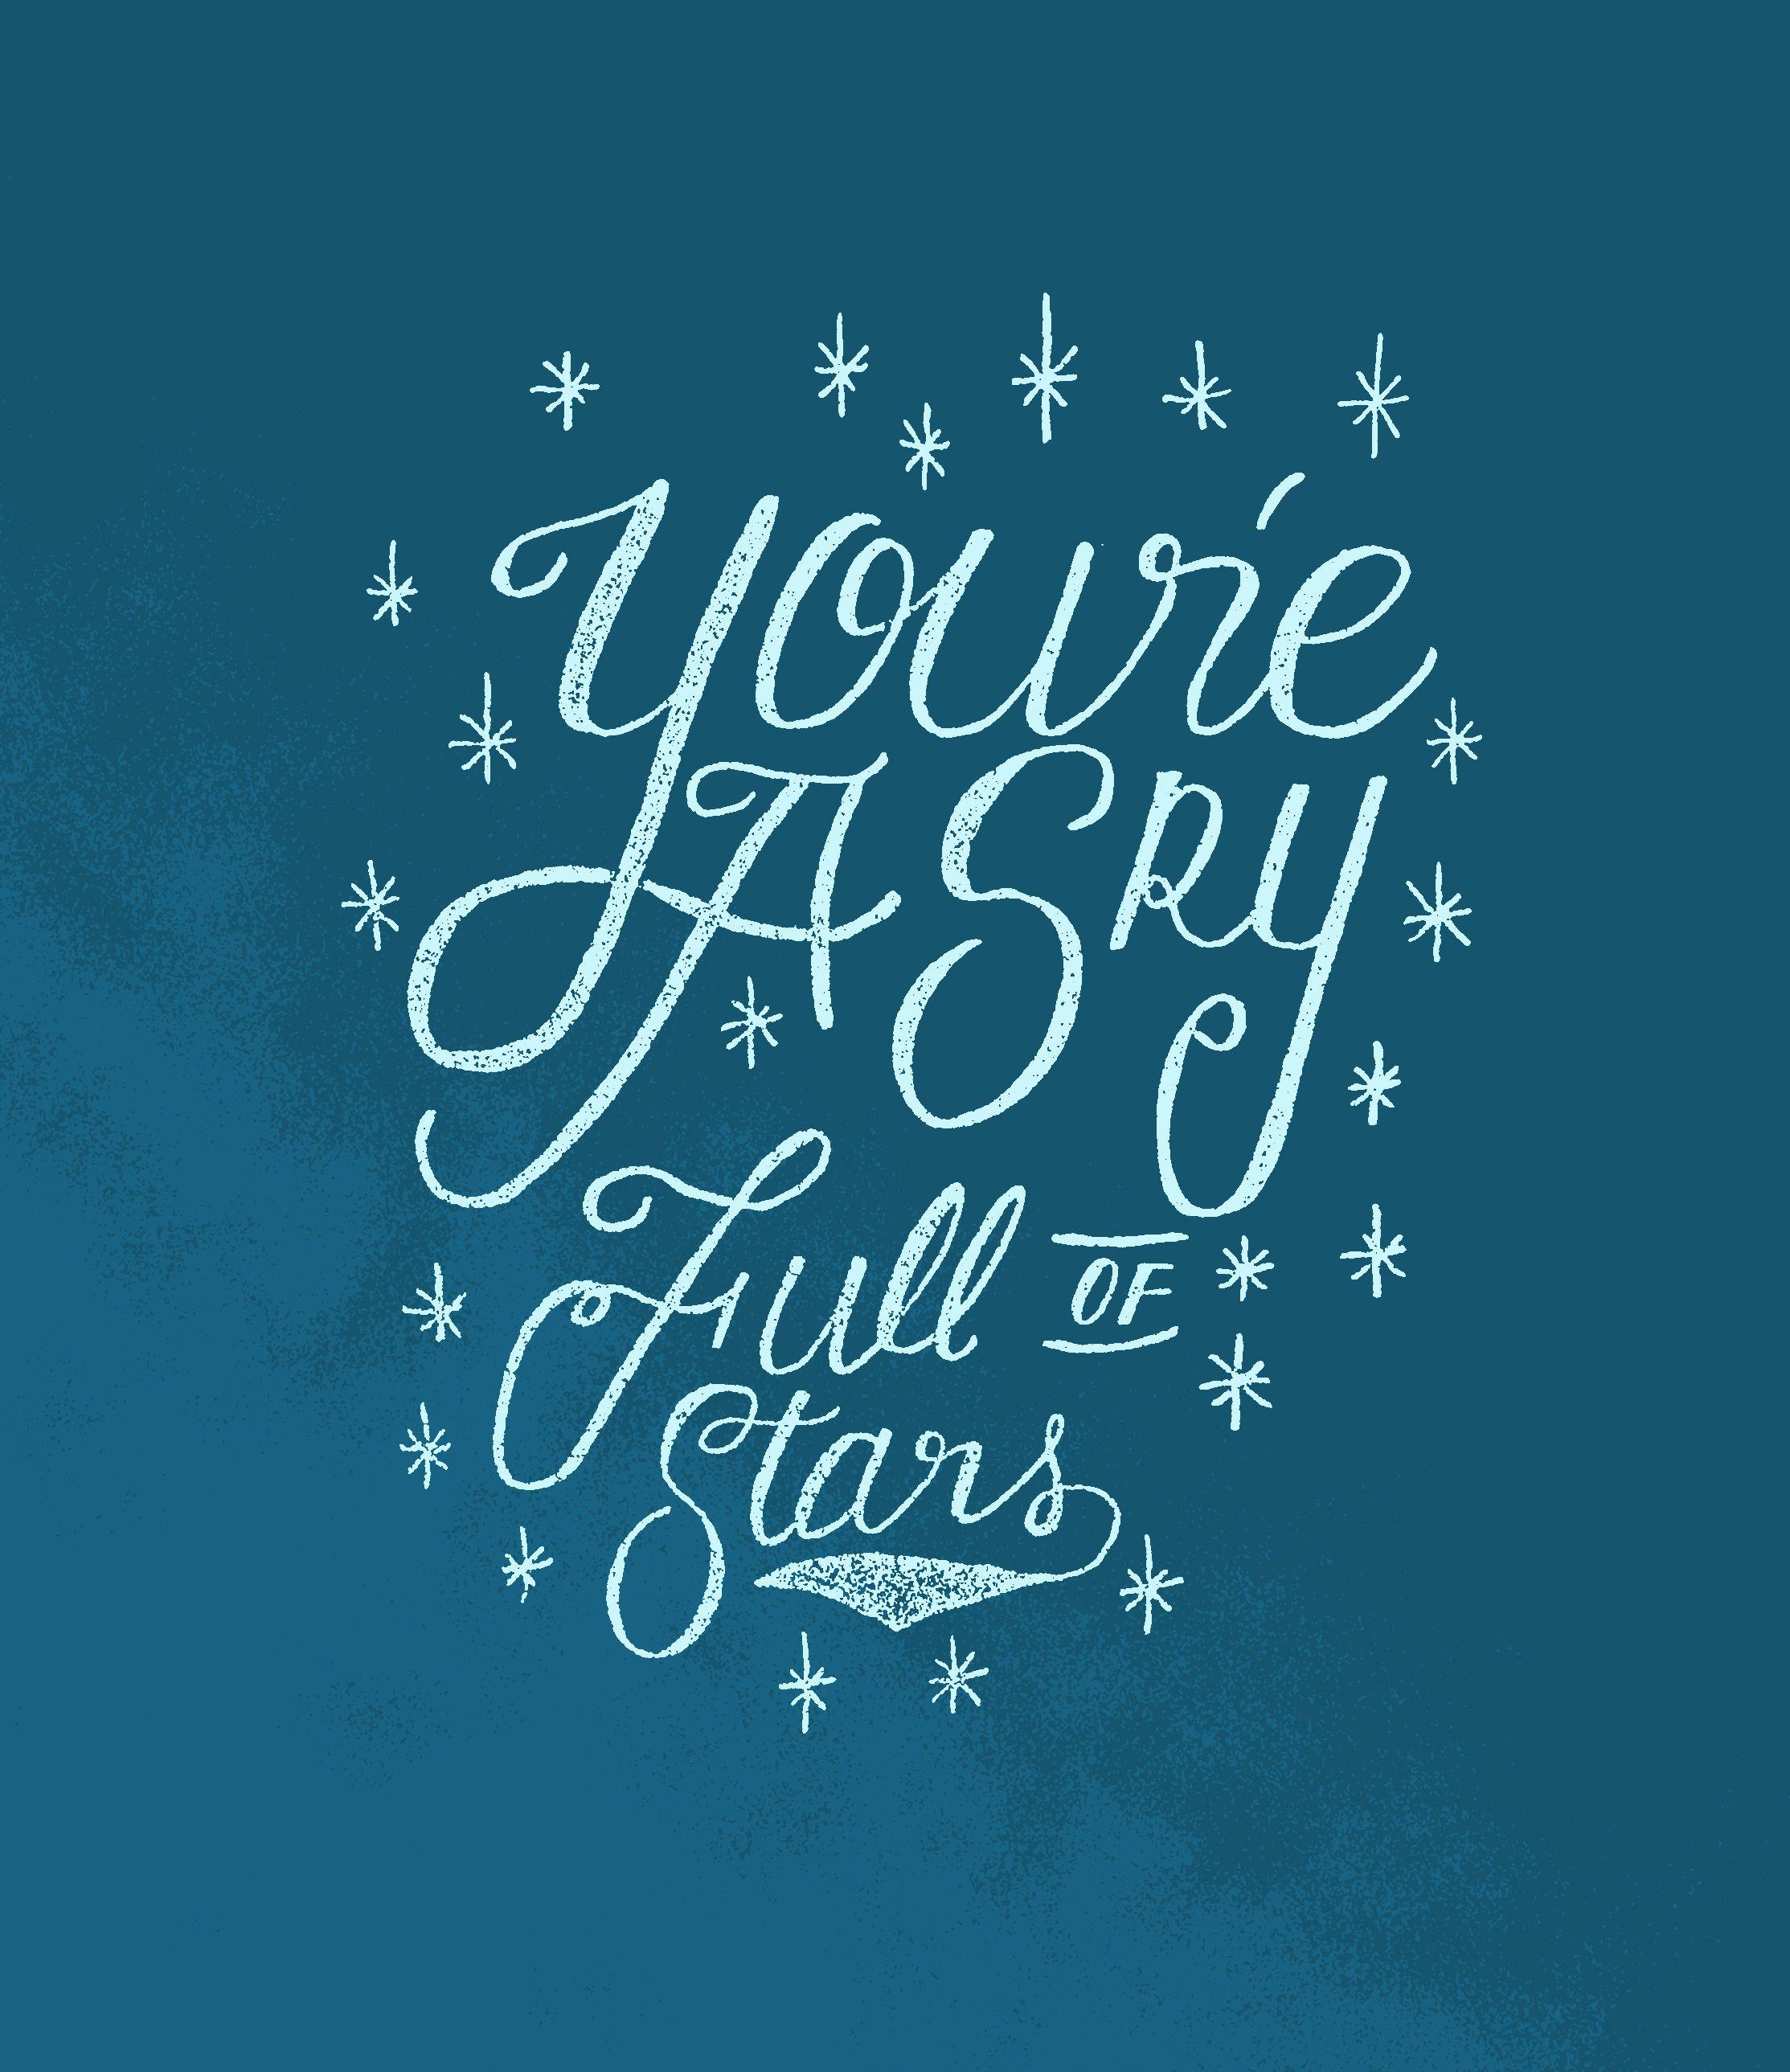 Uncategorized Sky Full Of Stars Coldplay youre a sky full of stars coldplay lyrics by adam gonzalez gonzalez